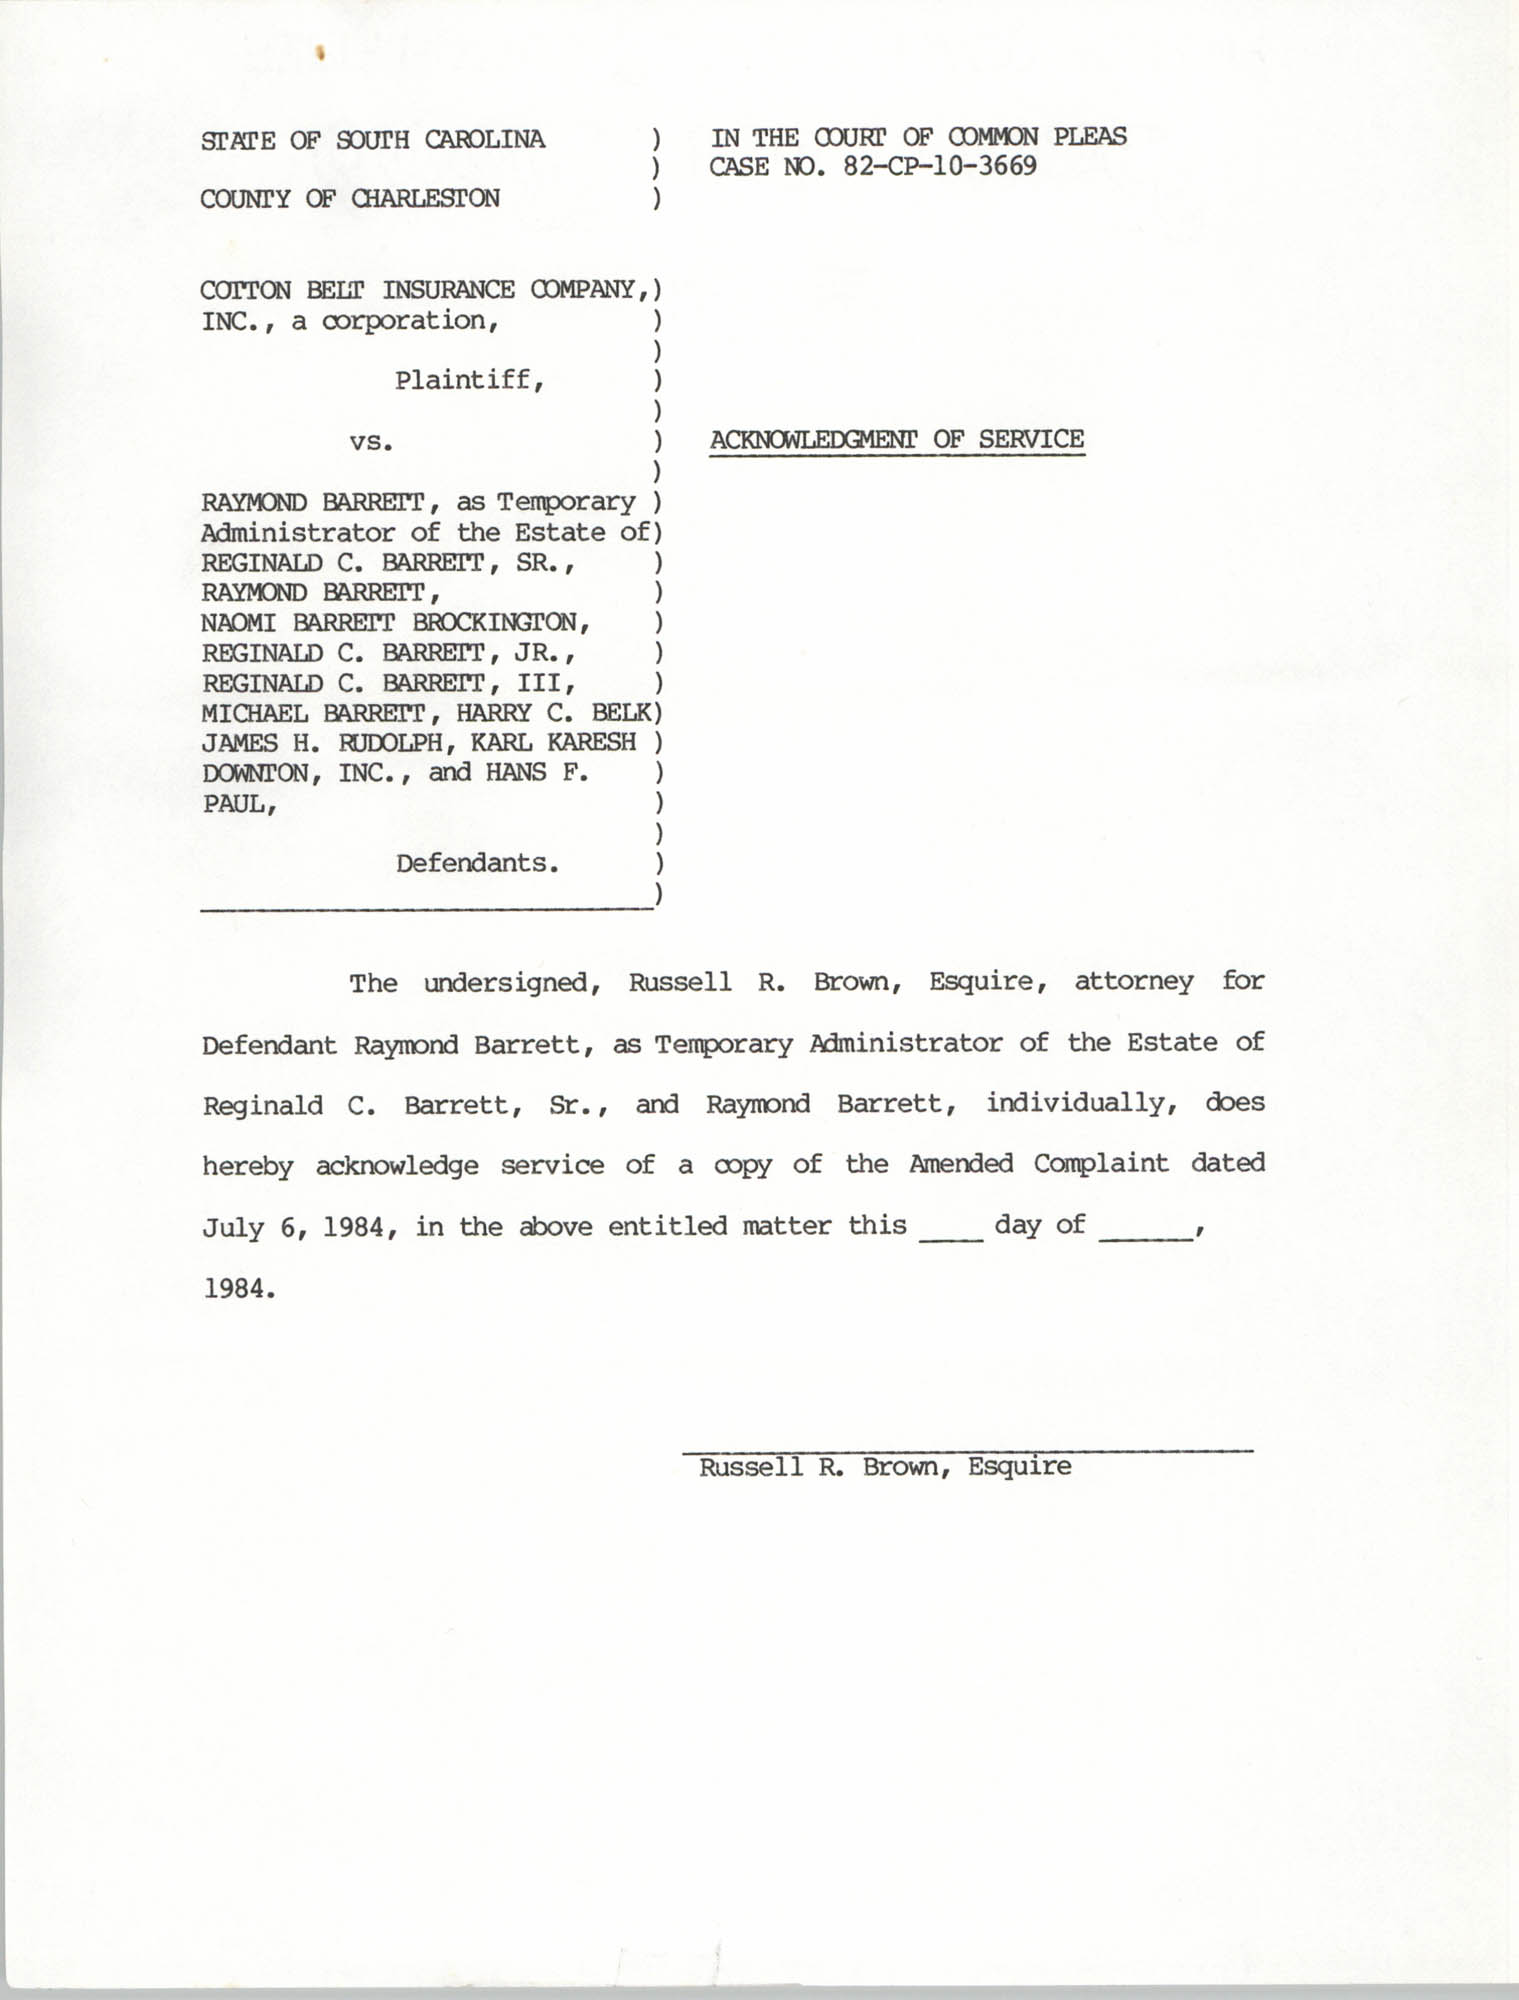 Acknowledgement of Service, State of South Carolina, County of Charleston, Cotton Belt Insurance Company vs. Reginald C. Barrett Sr., et al.